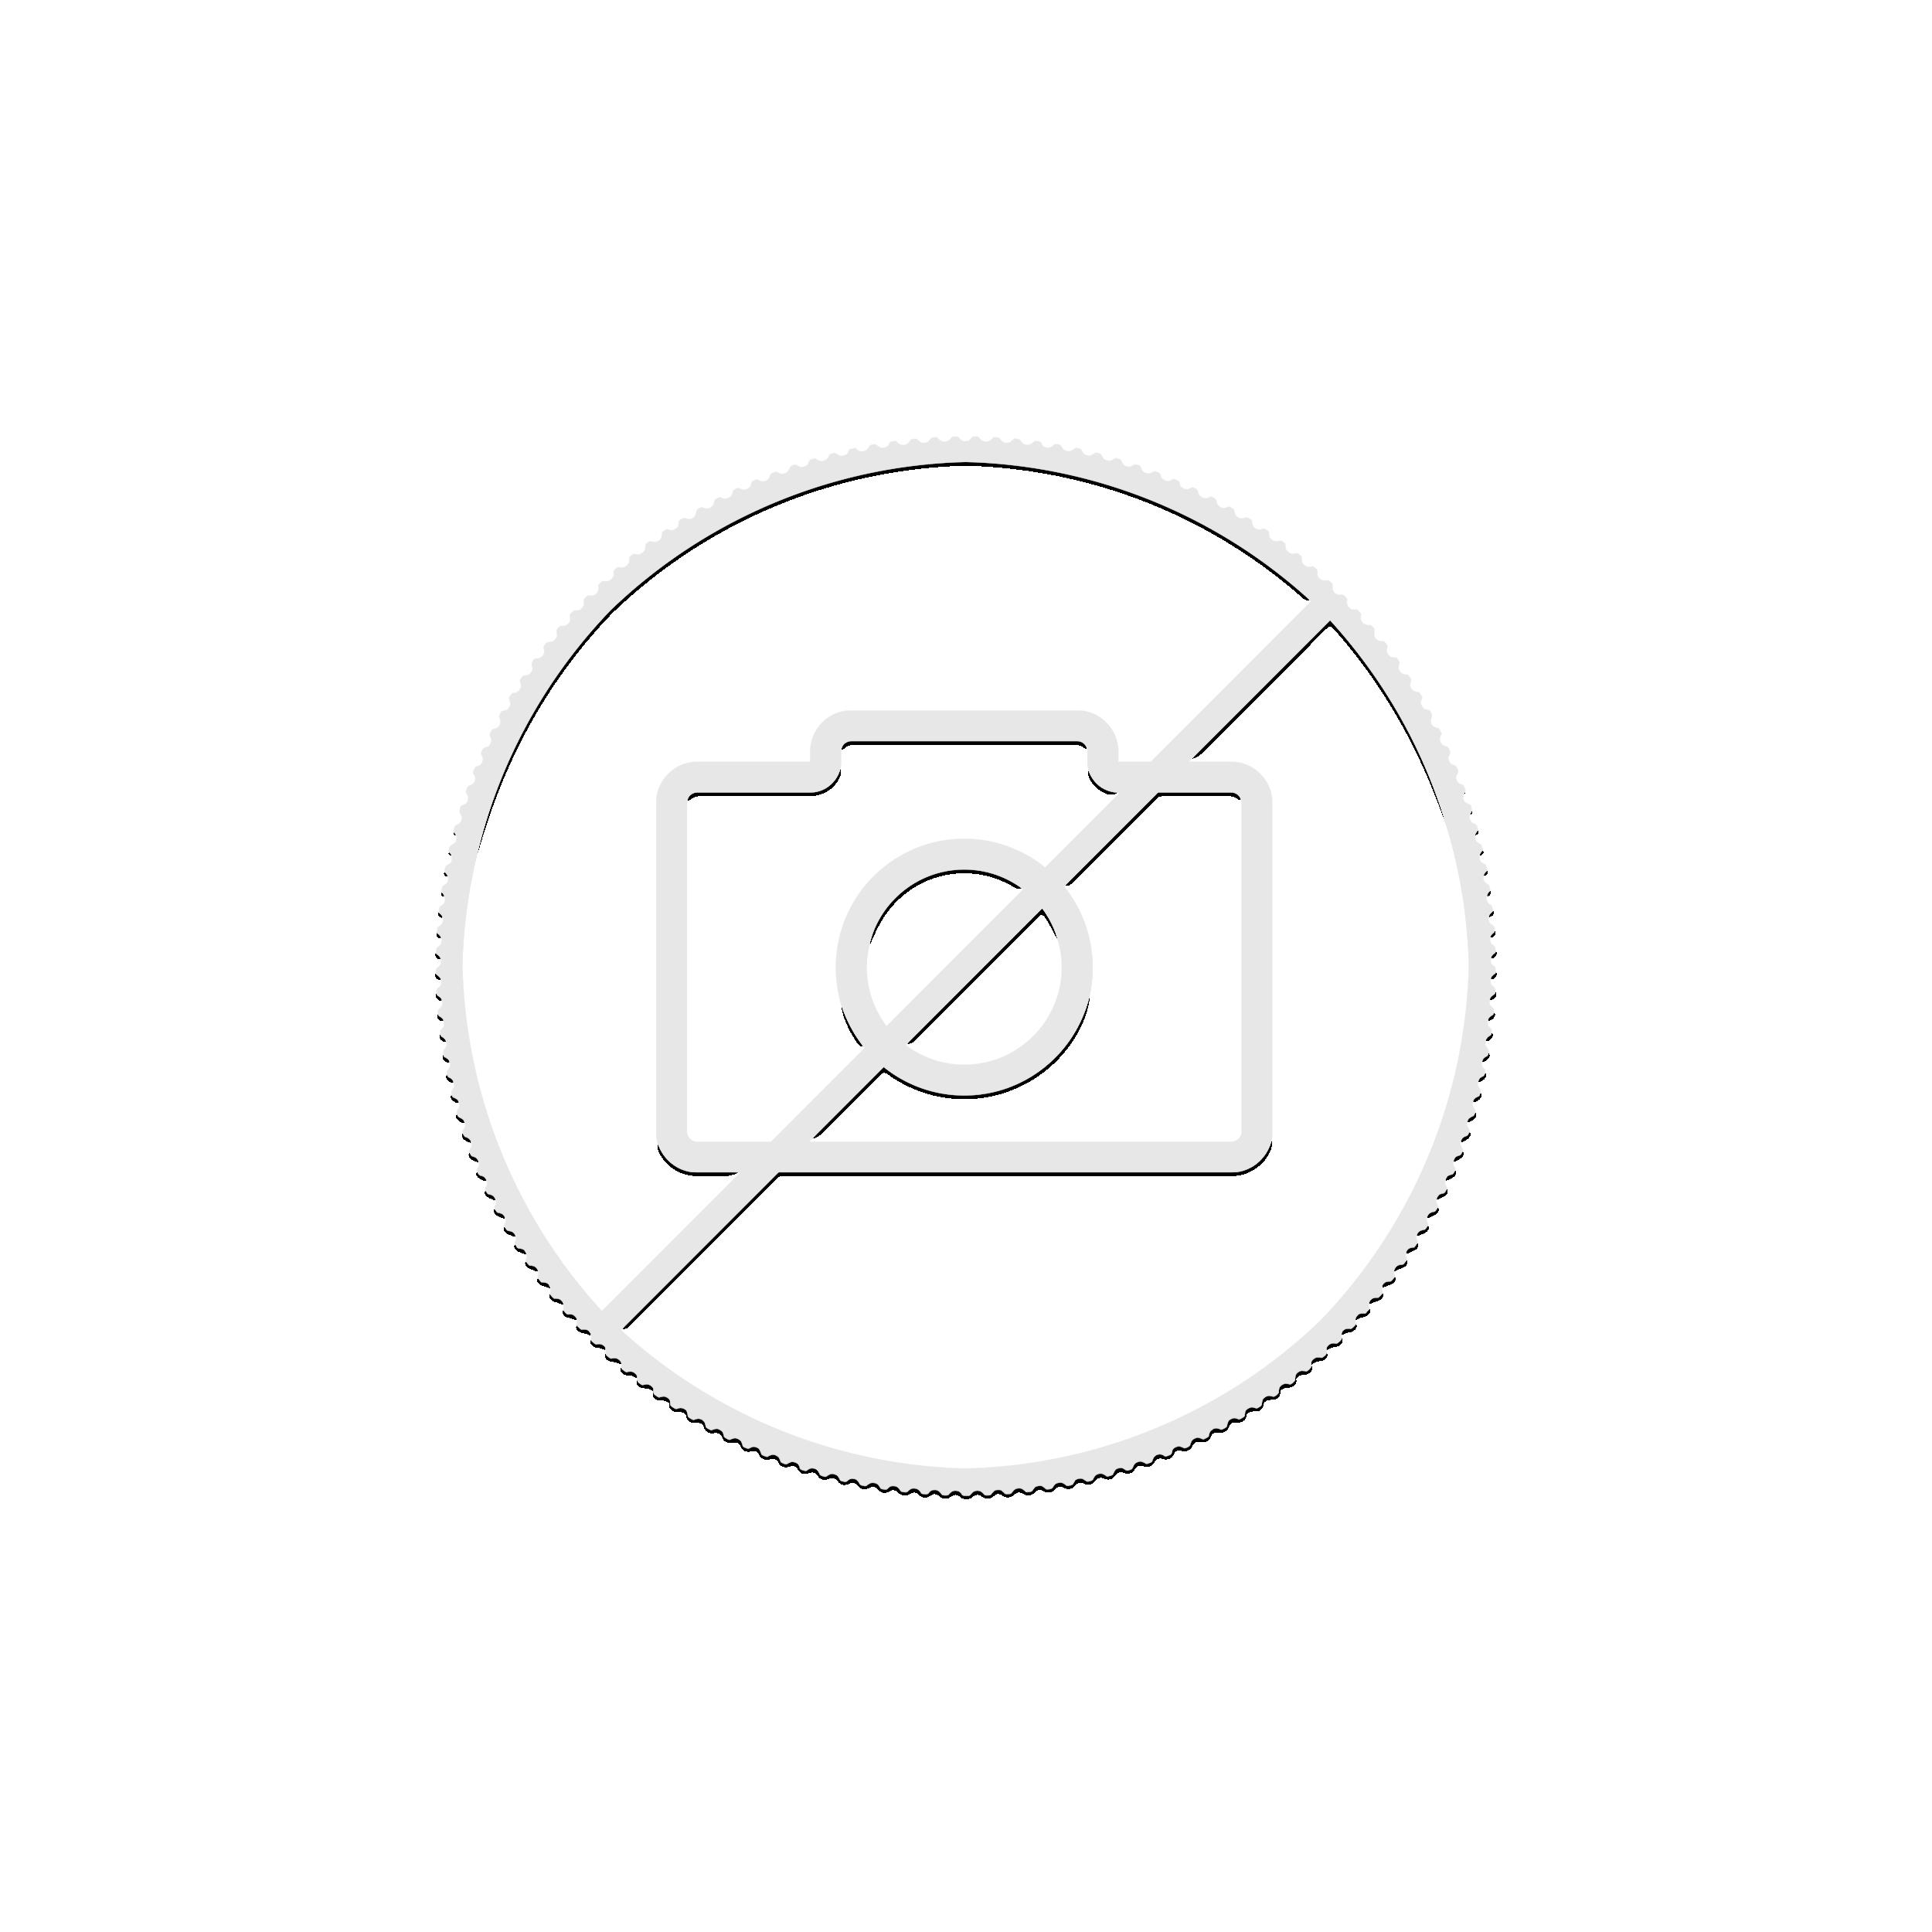 Gold Vienna Philharmonic 2020